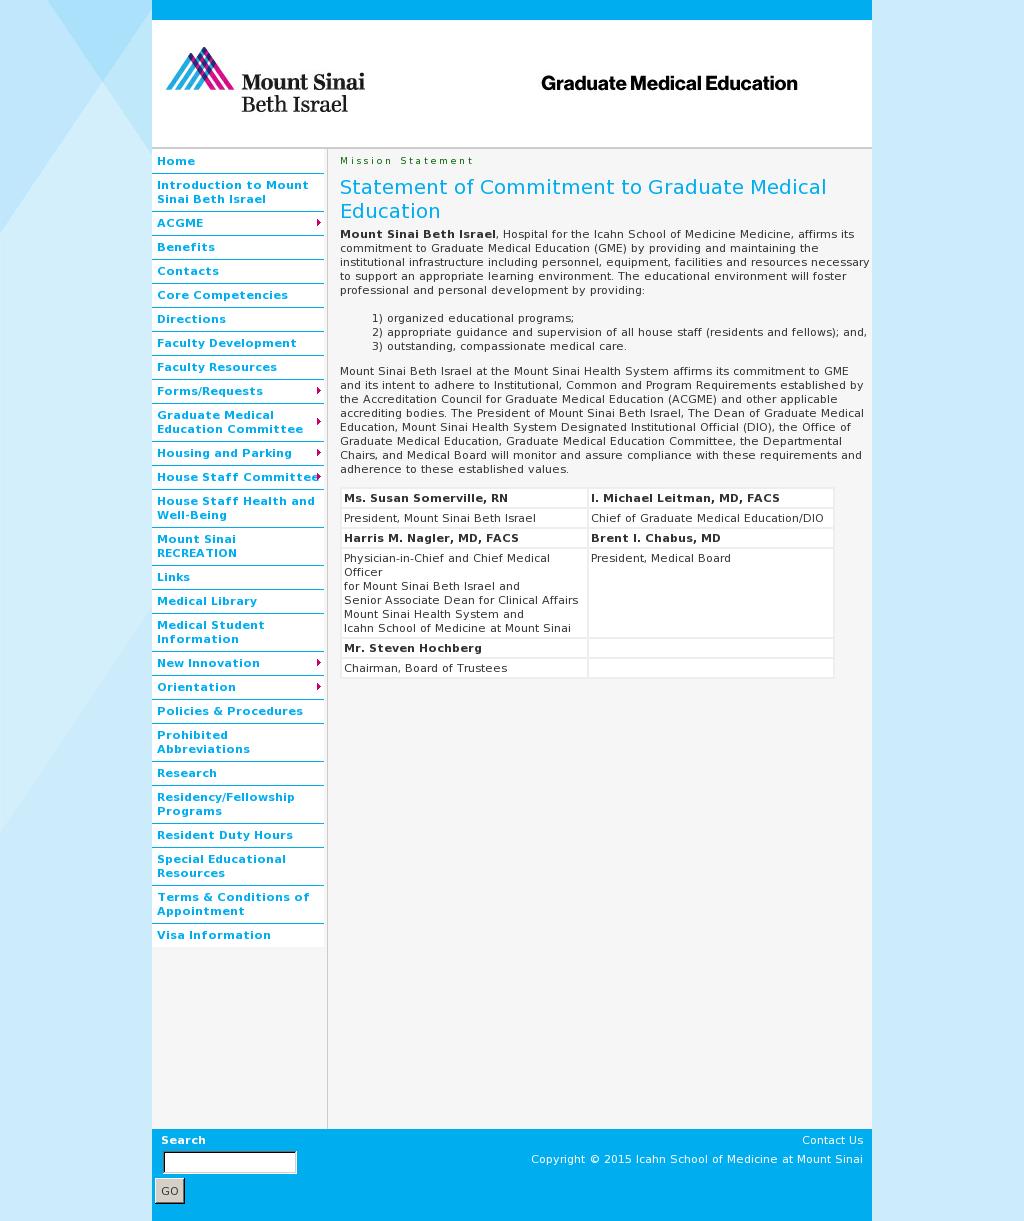 Beth Israel Graduate Medical Education Competitors, Revenue